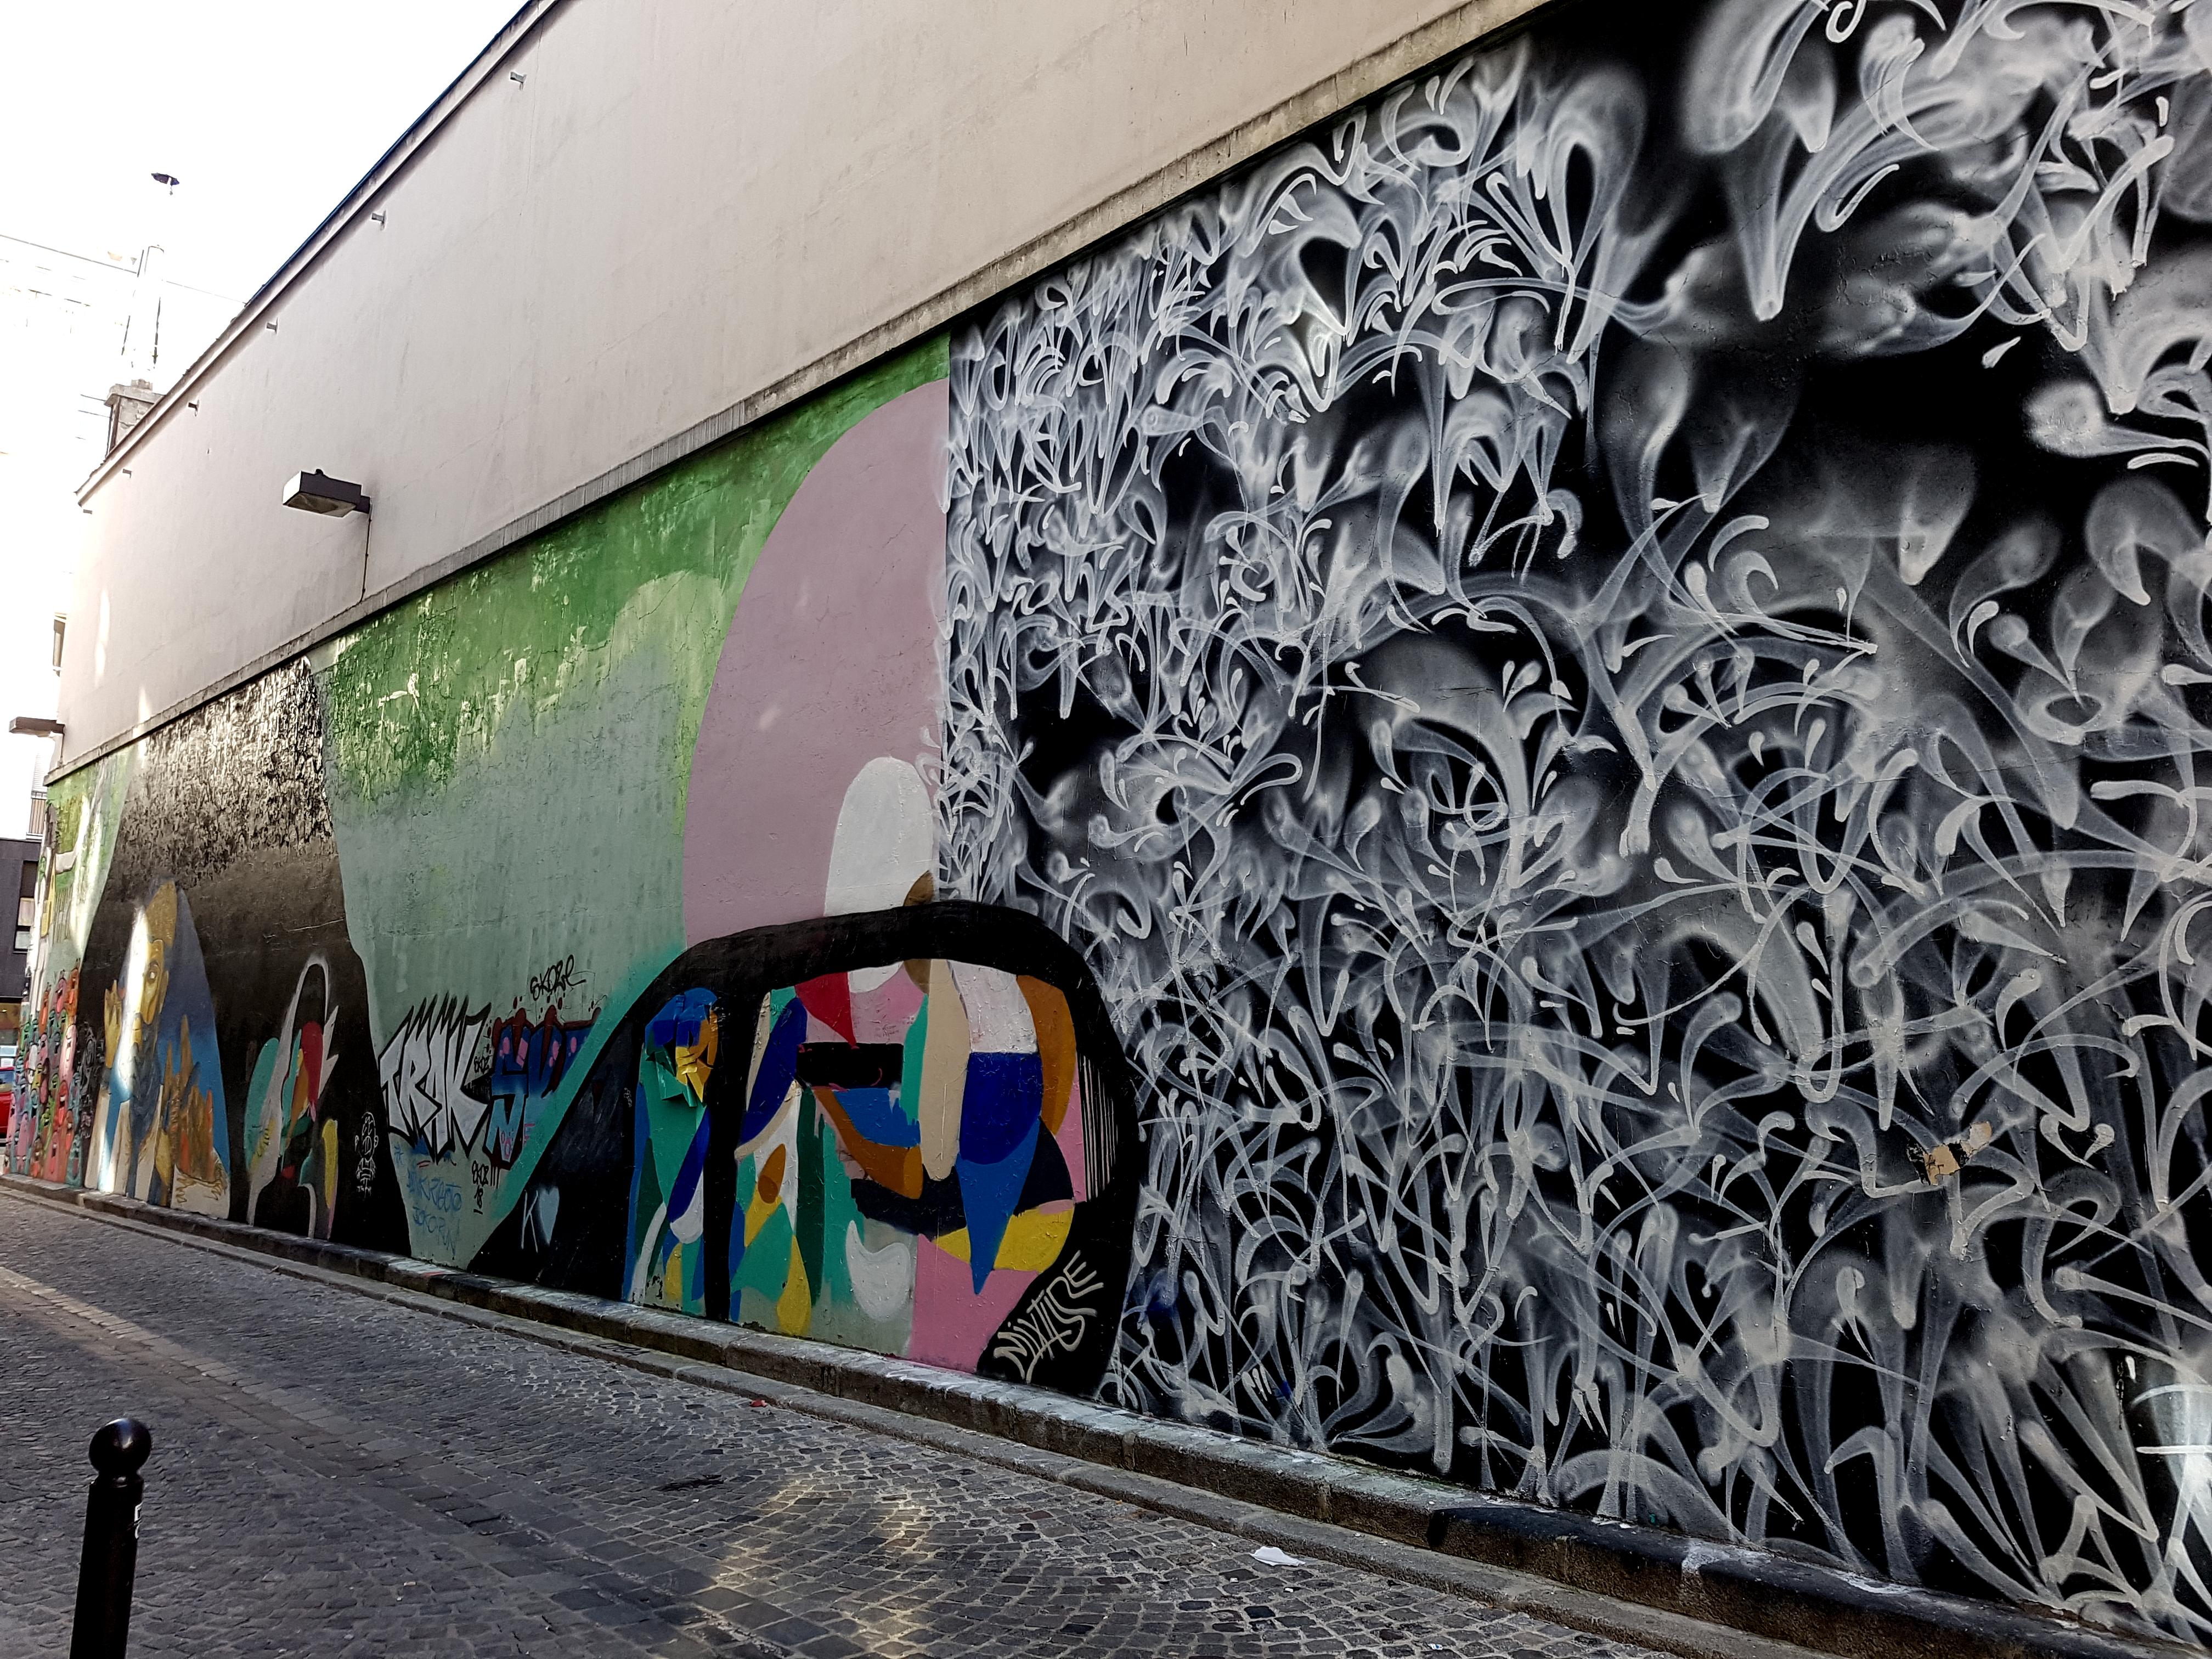 rafael sliks street art paris 10